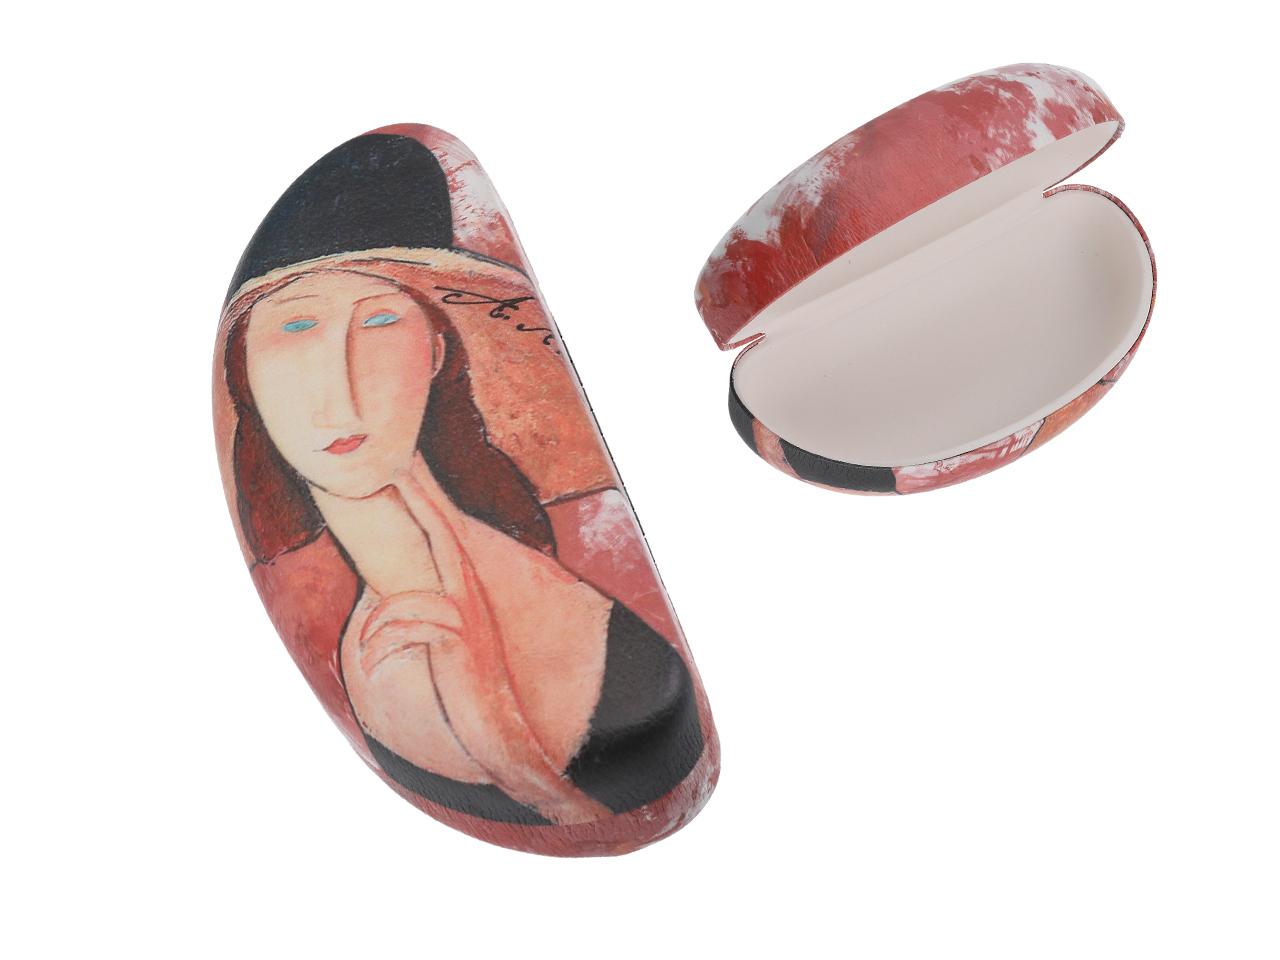 Mestres da pintura - A. Modigliani - A Mulher - Caixa para óculos